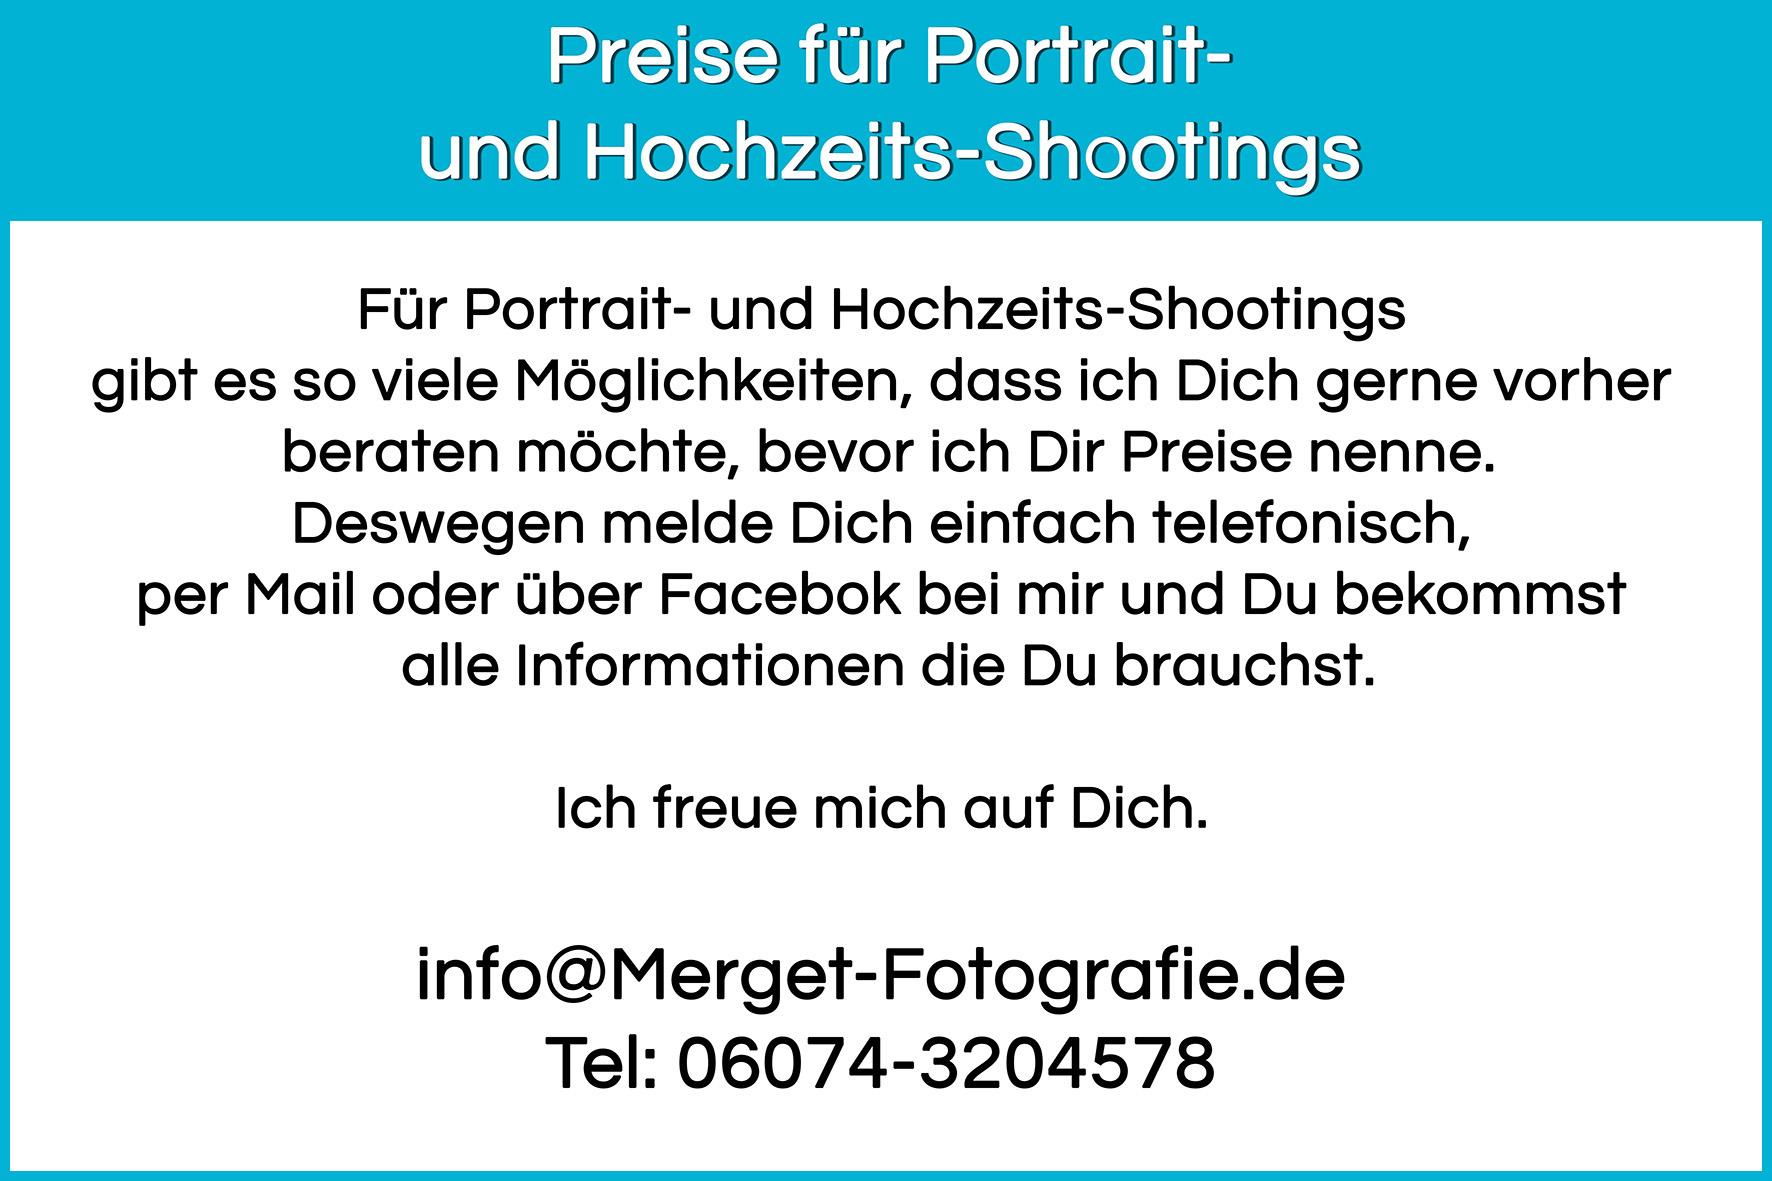 http://merget-fotografie.de/wordpress/wp-content/uploads/2017/02/preise-portrait.jpg